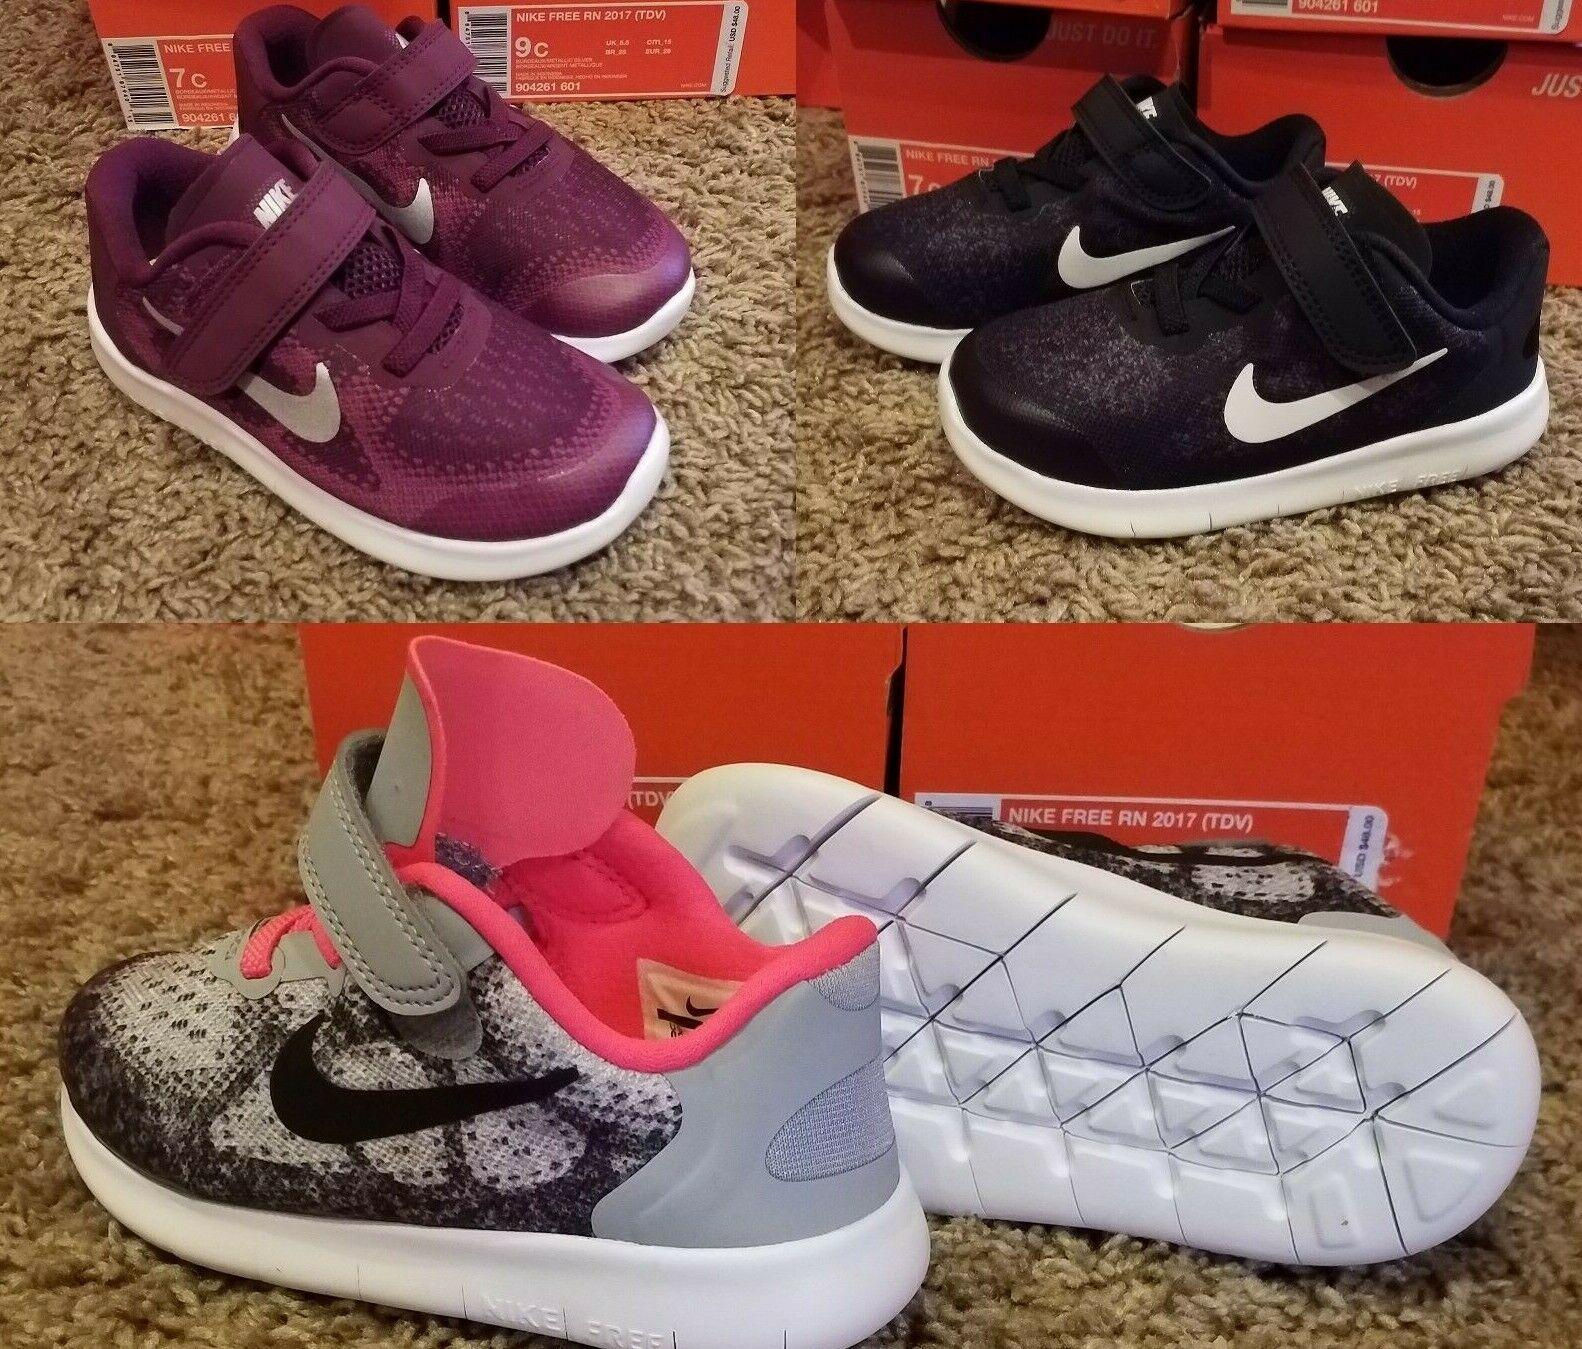 promo code 9906c 30dca Girl's Nike FREE RN 2017 (TDV) Toddler Infant Running Shoe 904261 001 Size  9-10